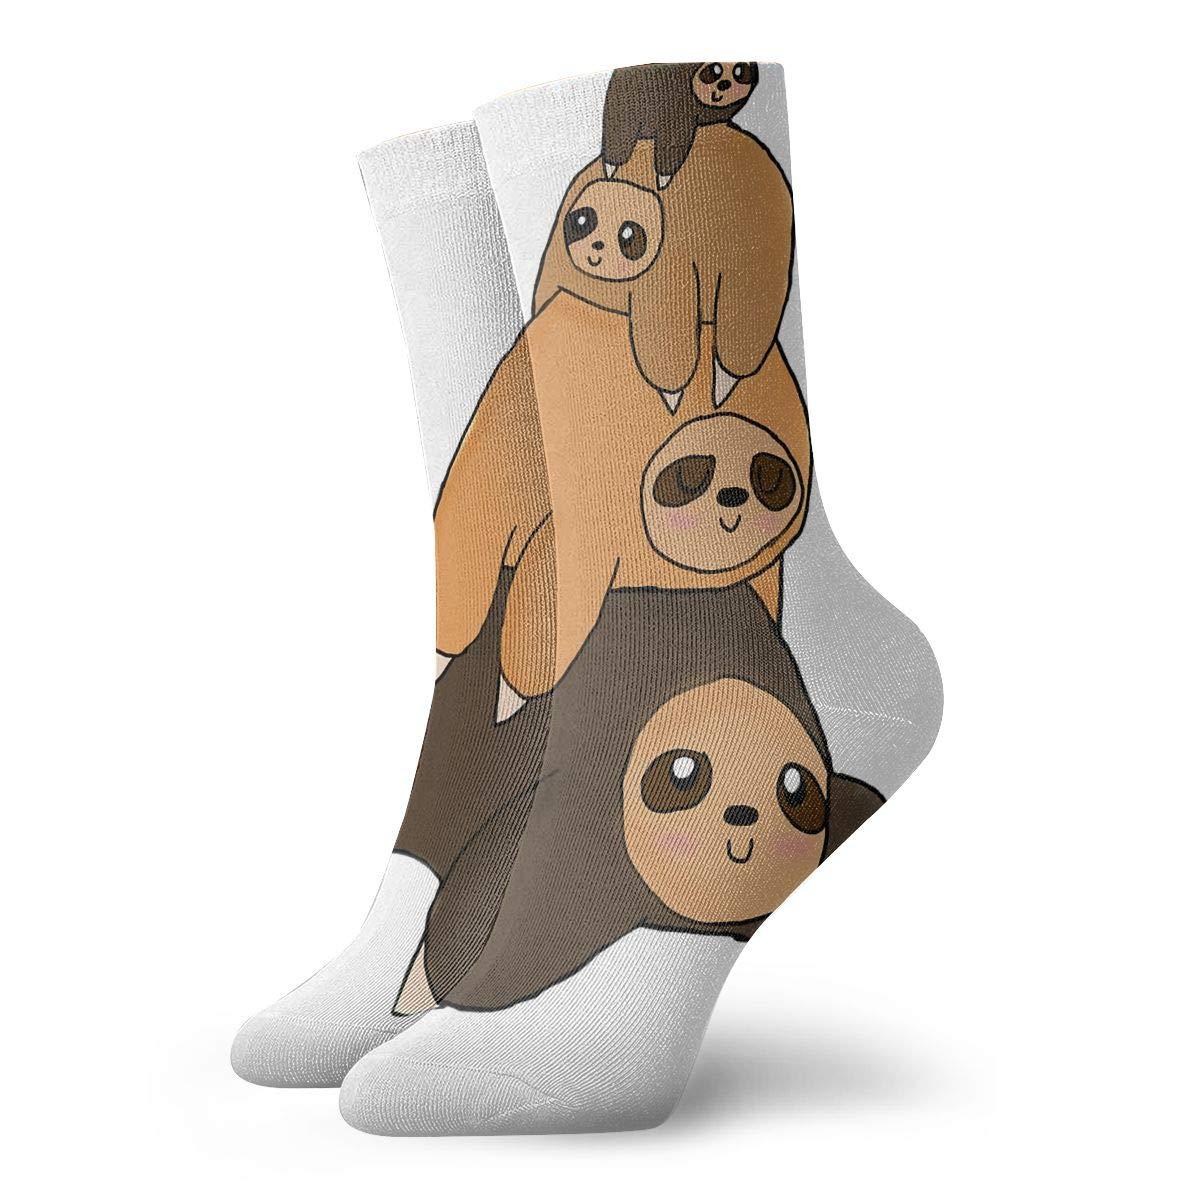 Cute Sloth Fashion Dress Socks Short Socks Leisure Travel 11.8 Inch